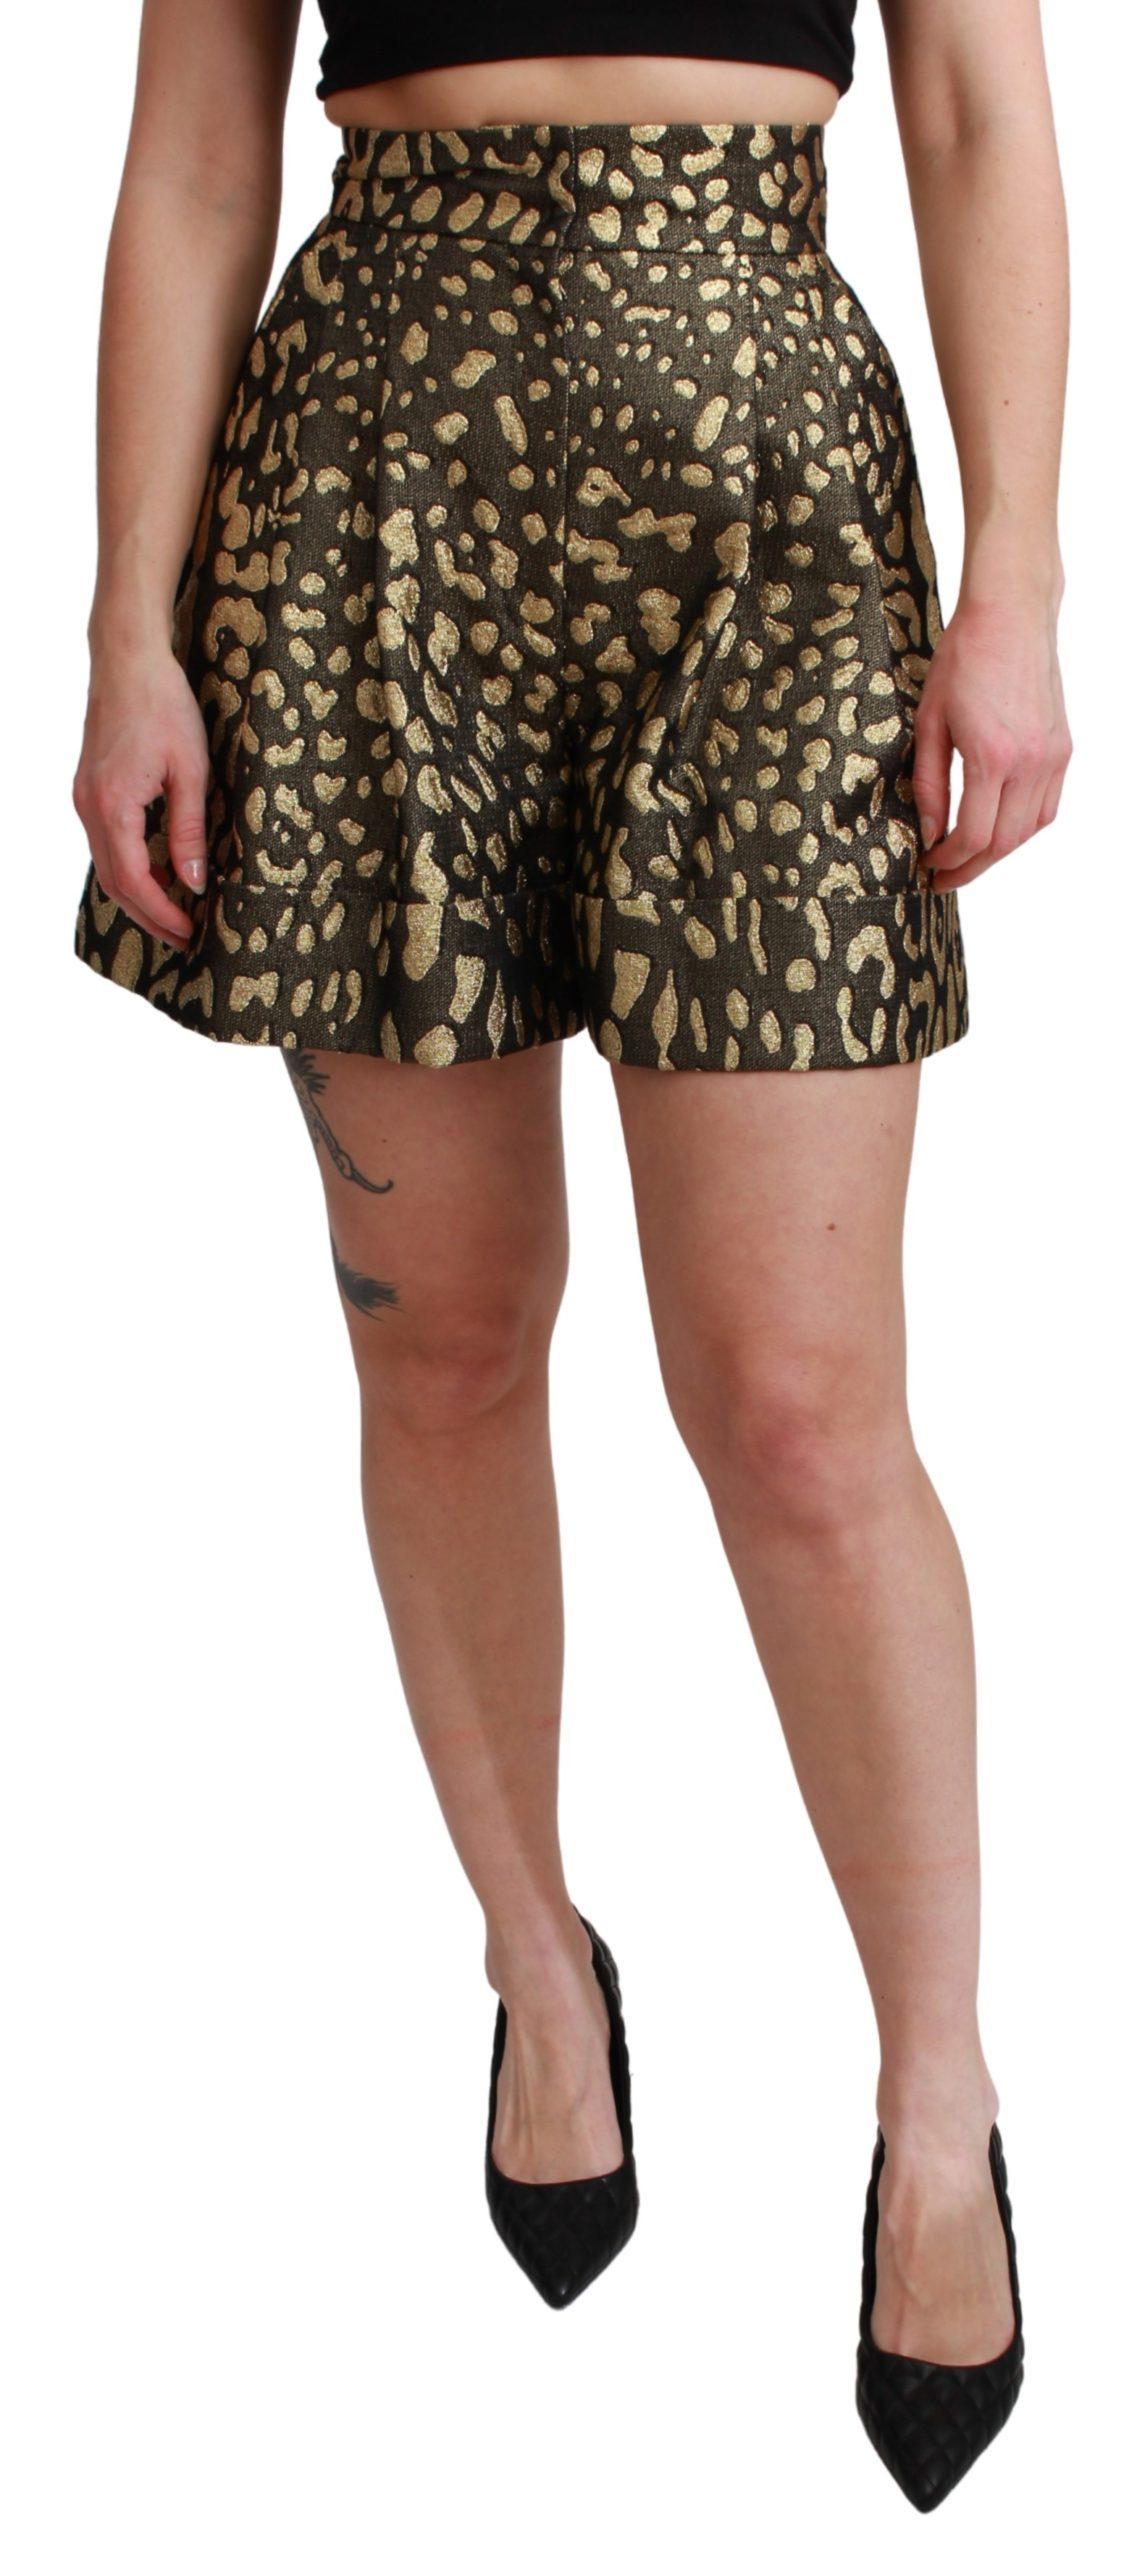 Black Gold High Waist Mini Cotton Shorts - IT40|S